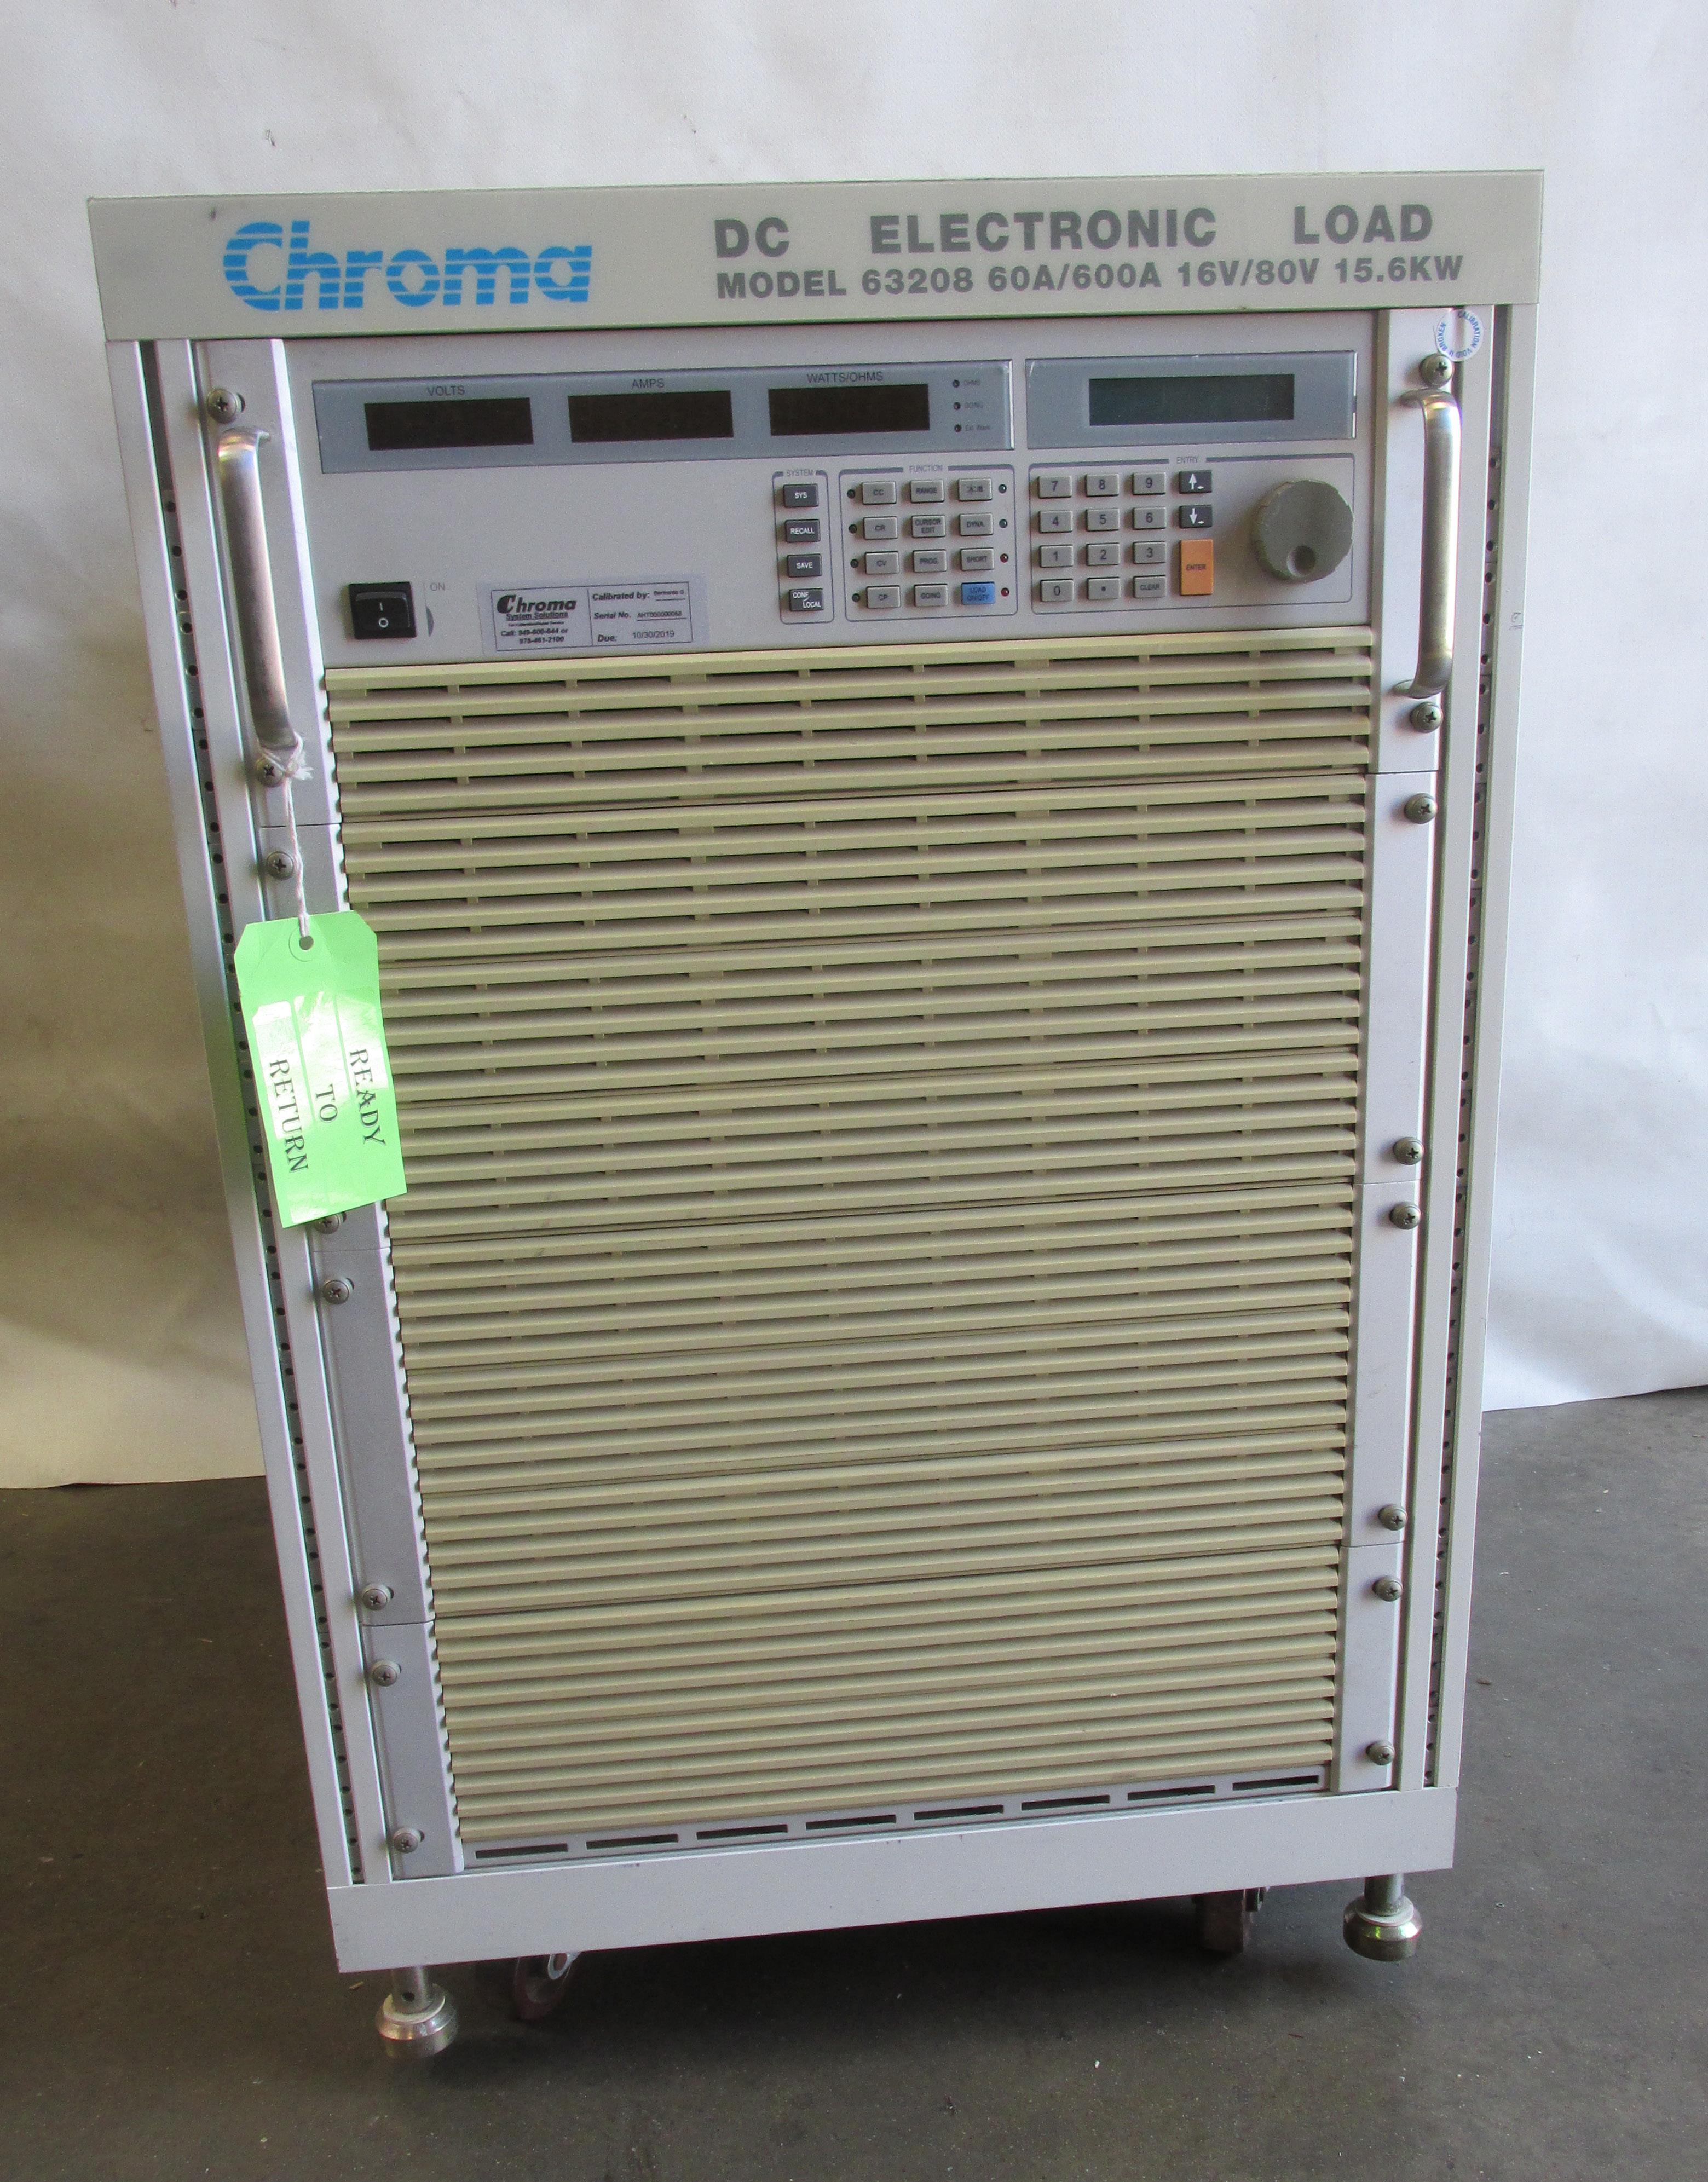 63208 60A/600A 16V80V